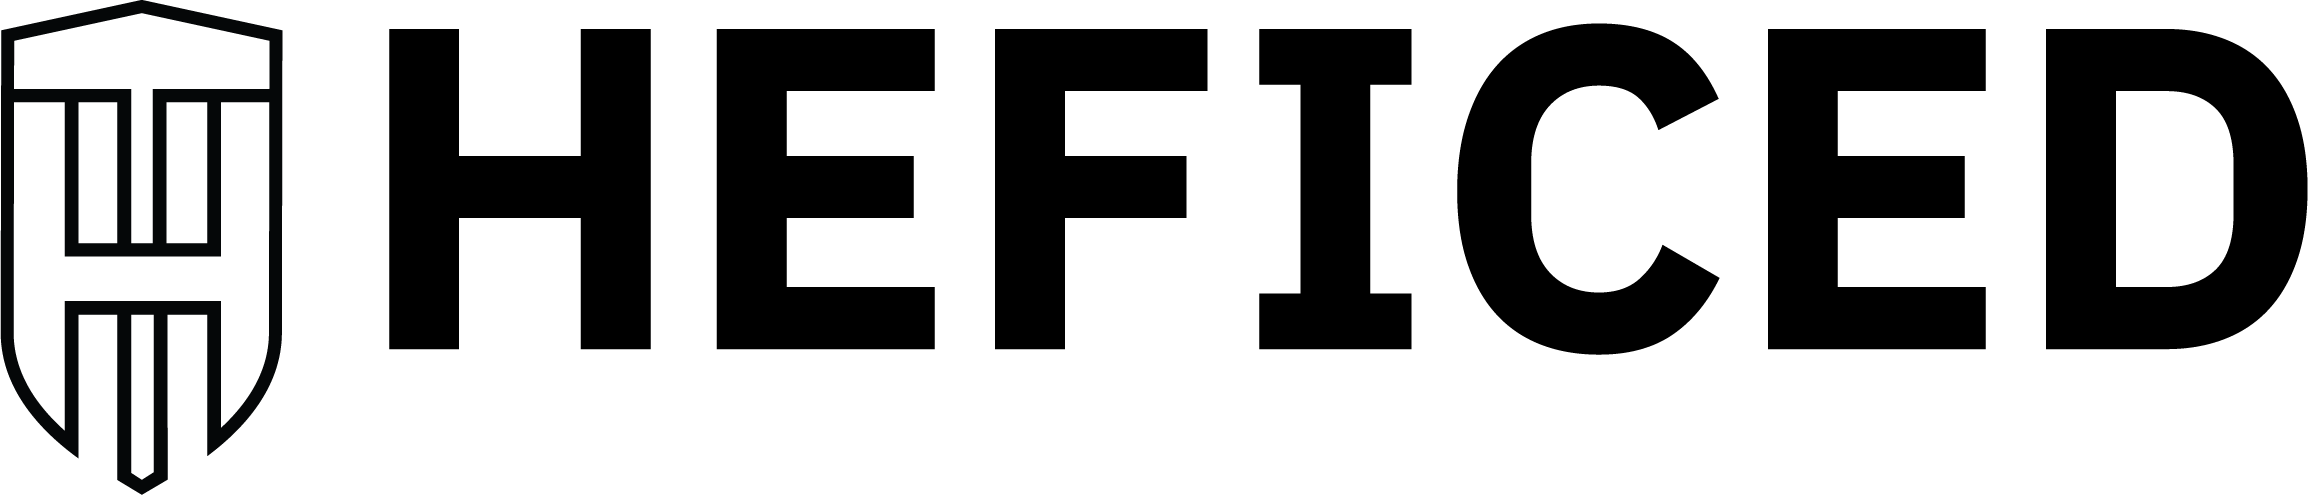 Provider logo for Heficed